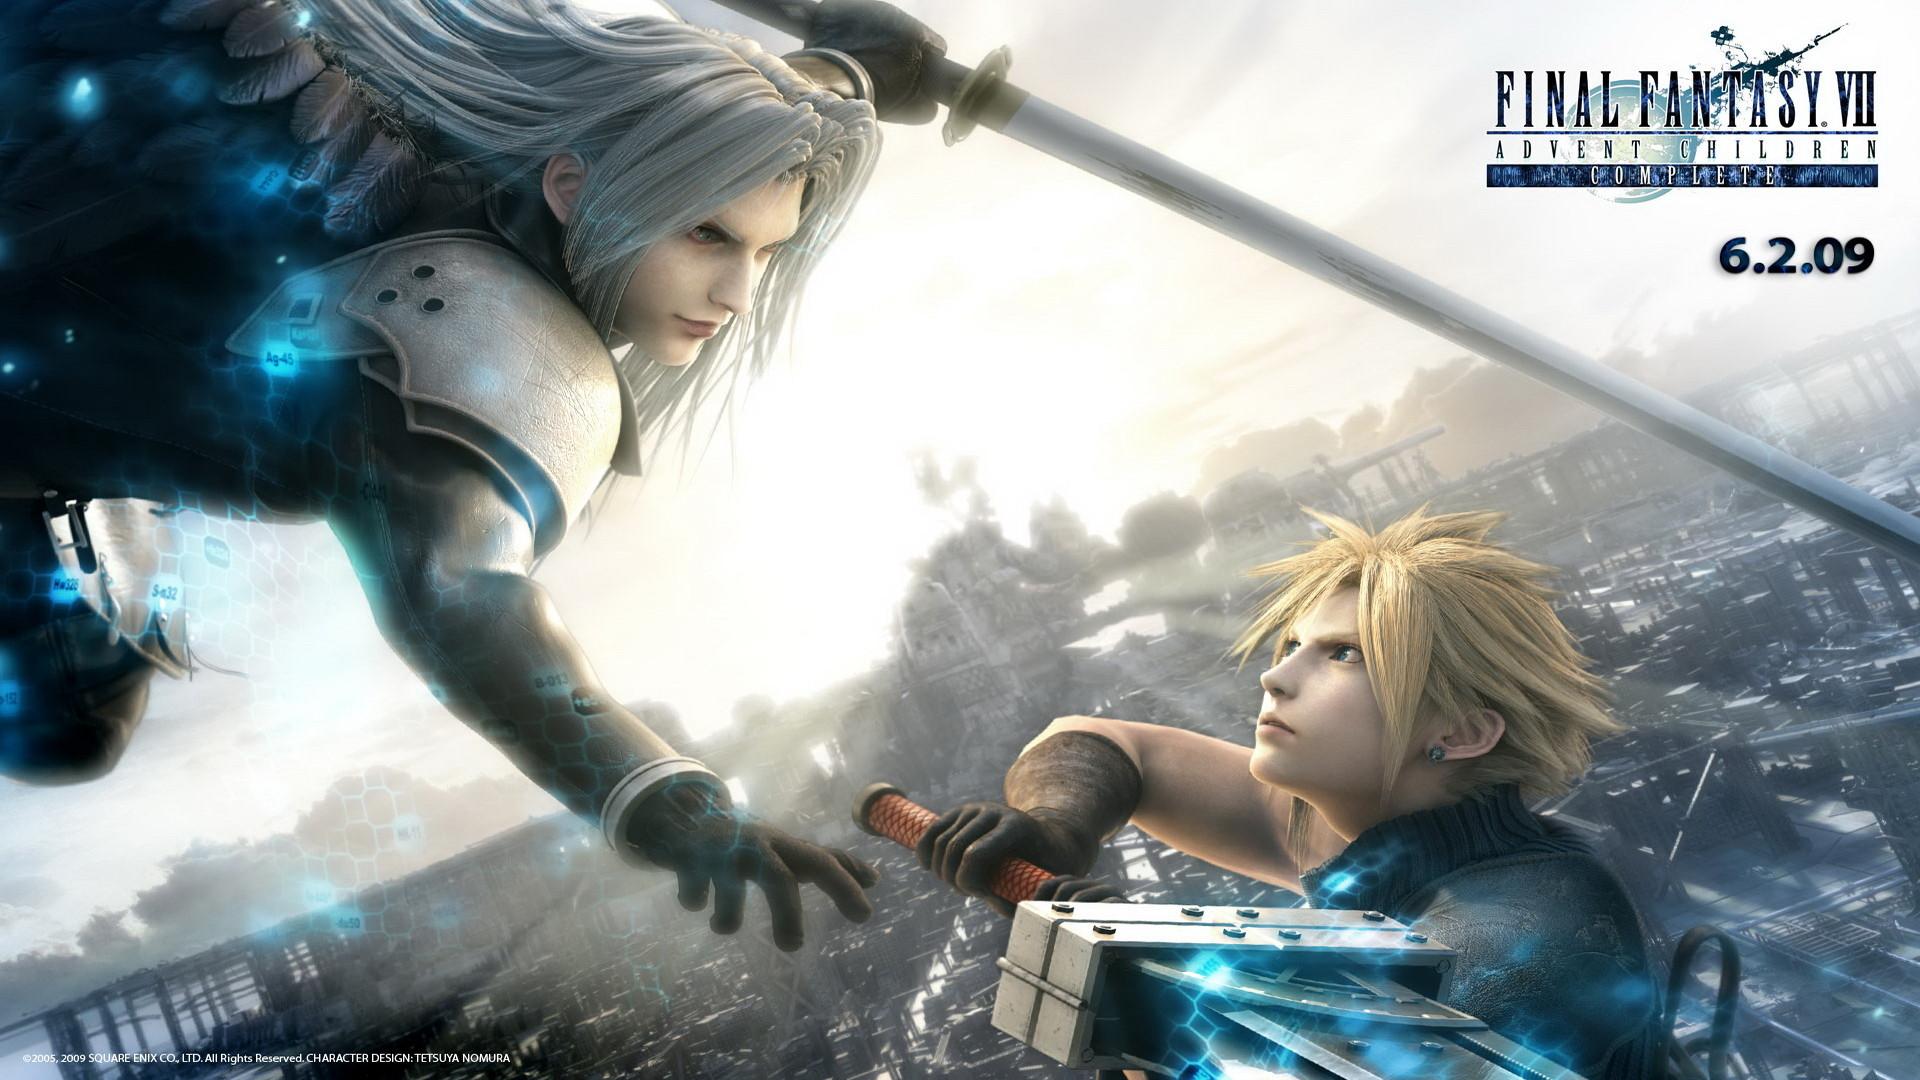 Final Fantasy HD Wallpaper 1080p (81+ images)